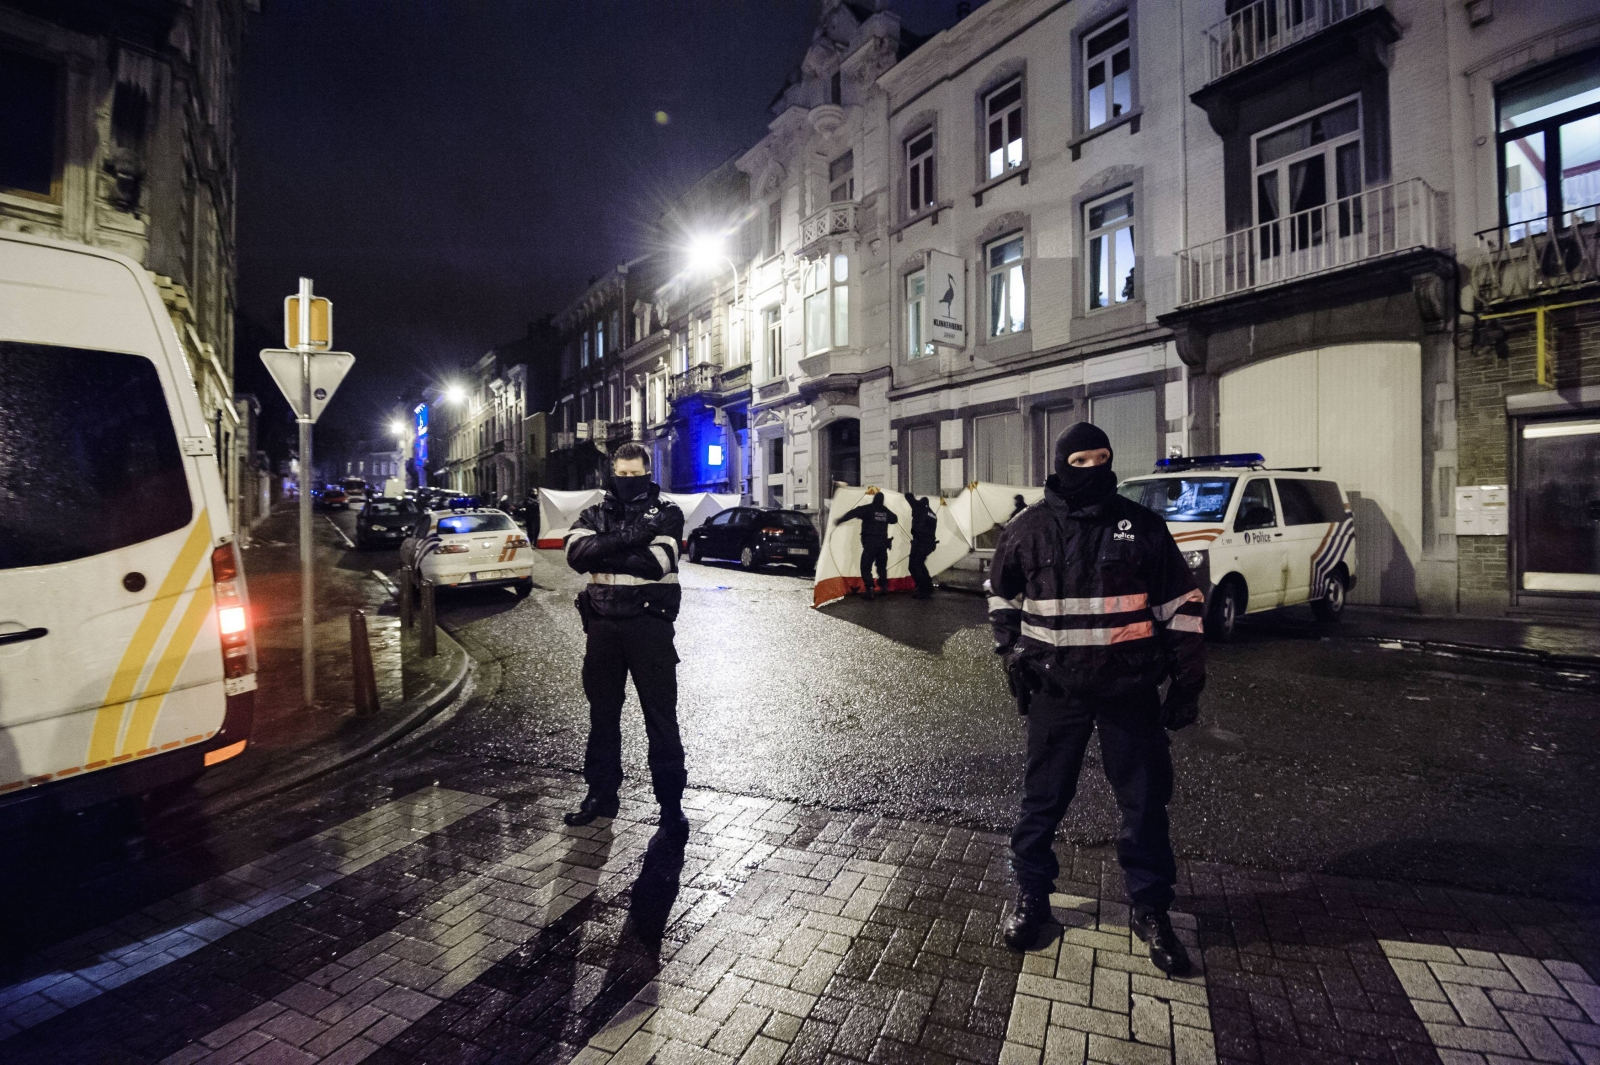 Belgium Verviers Raid: Police avert 'Charlie Hebdo style' attack